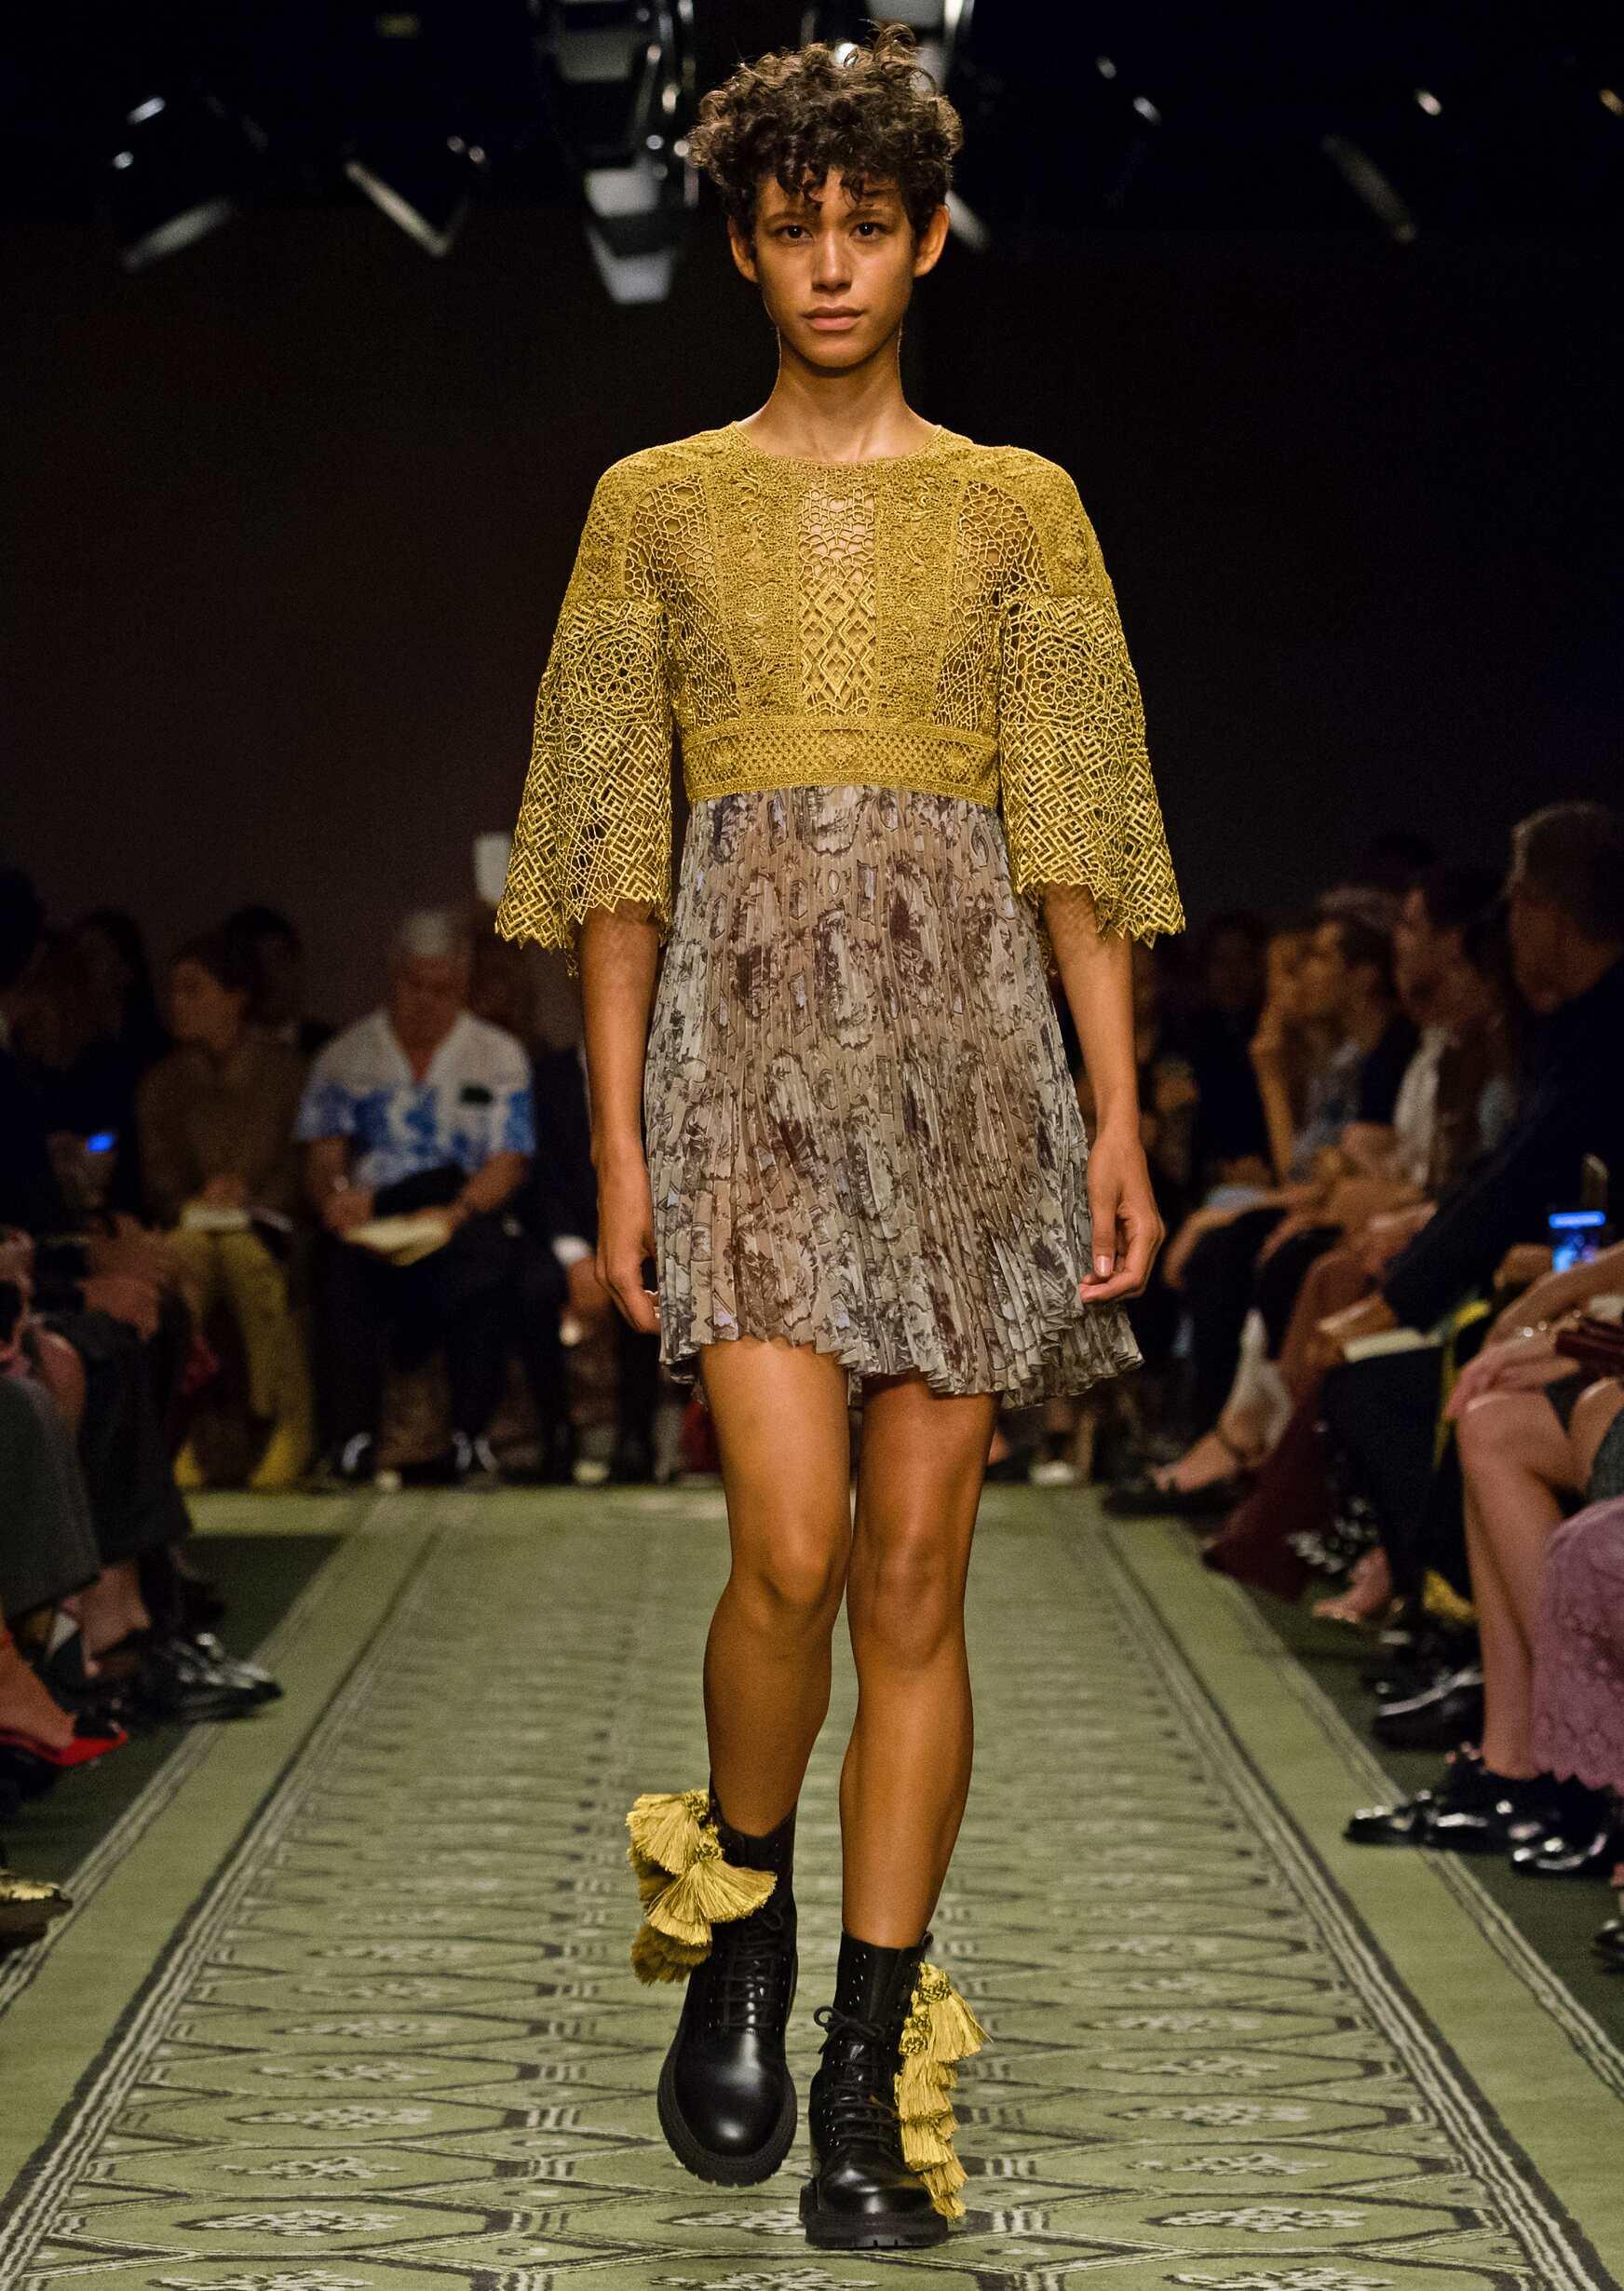 Fashion Woman Model Burberry Catwalk London Fashion Week